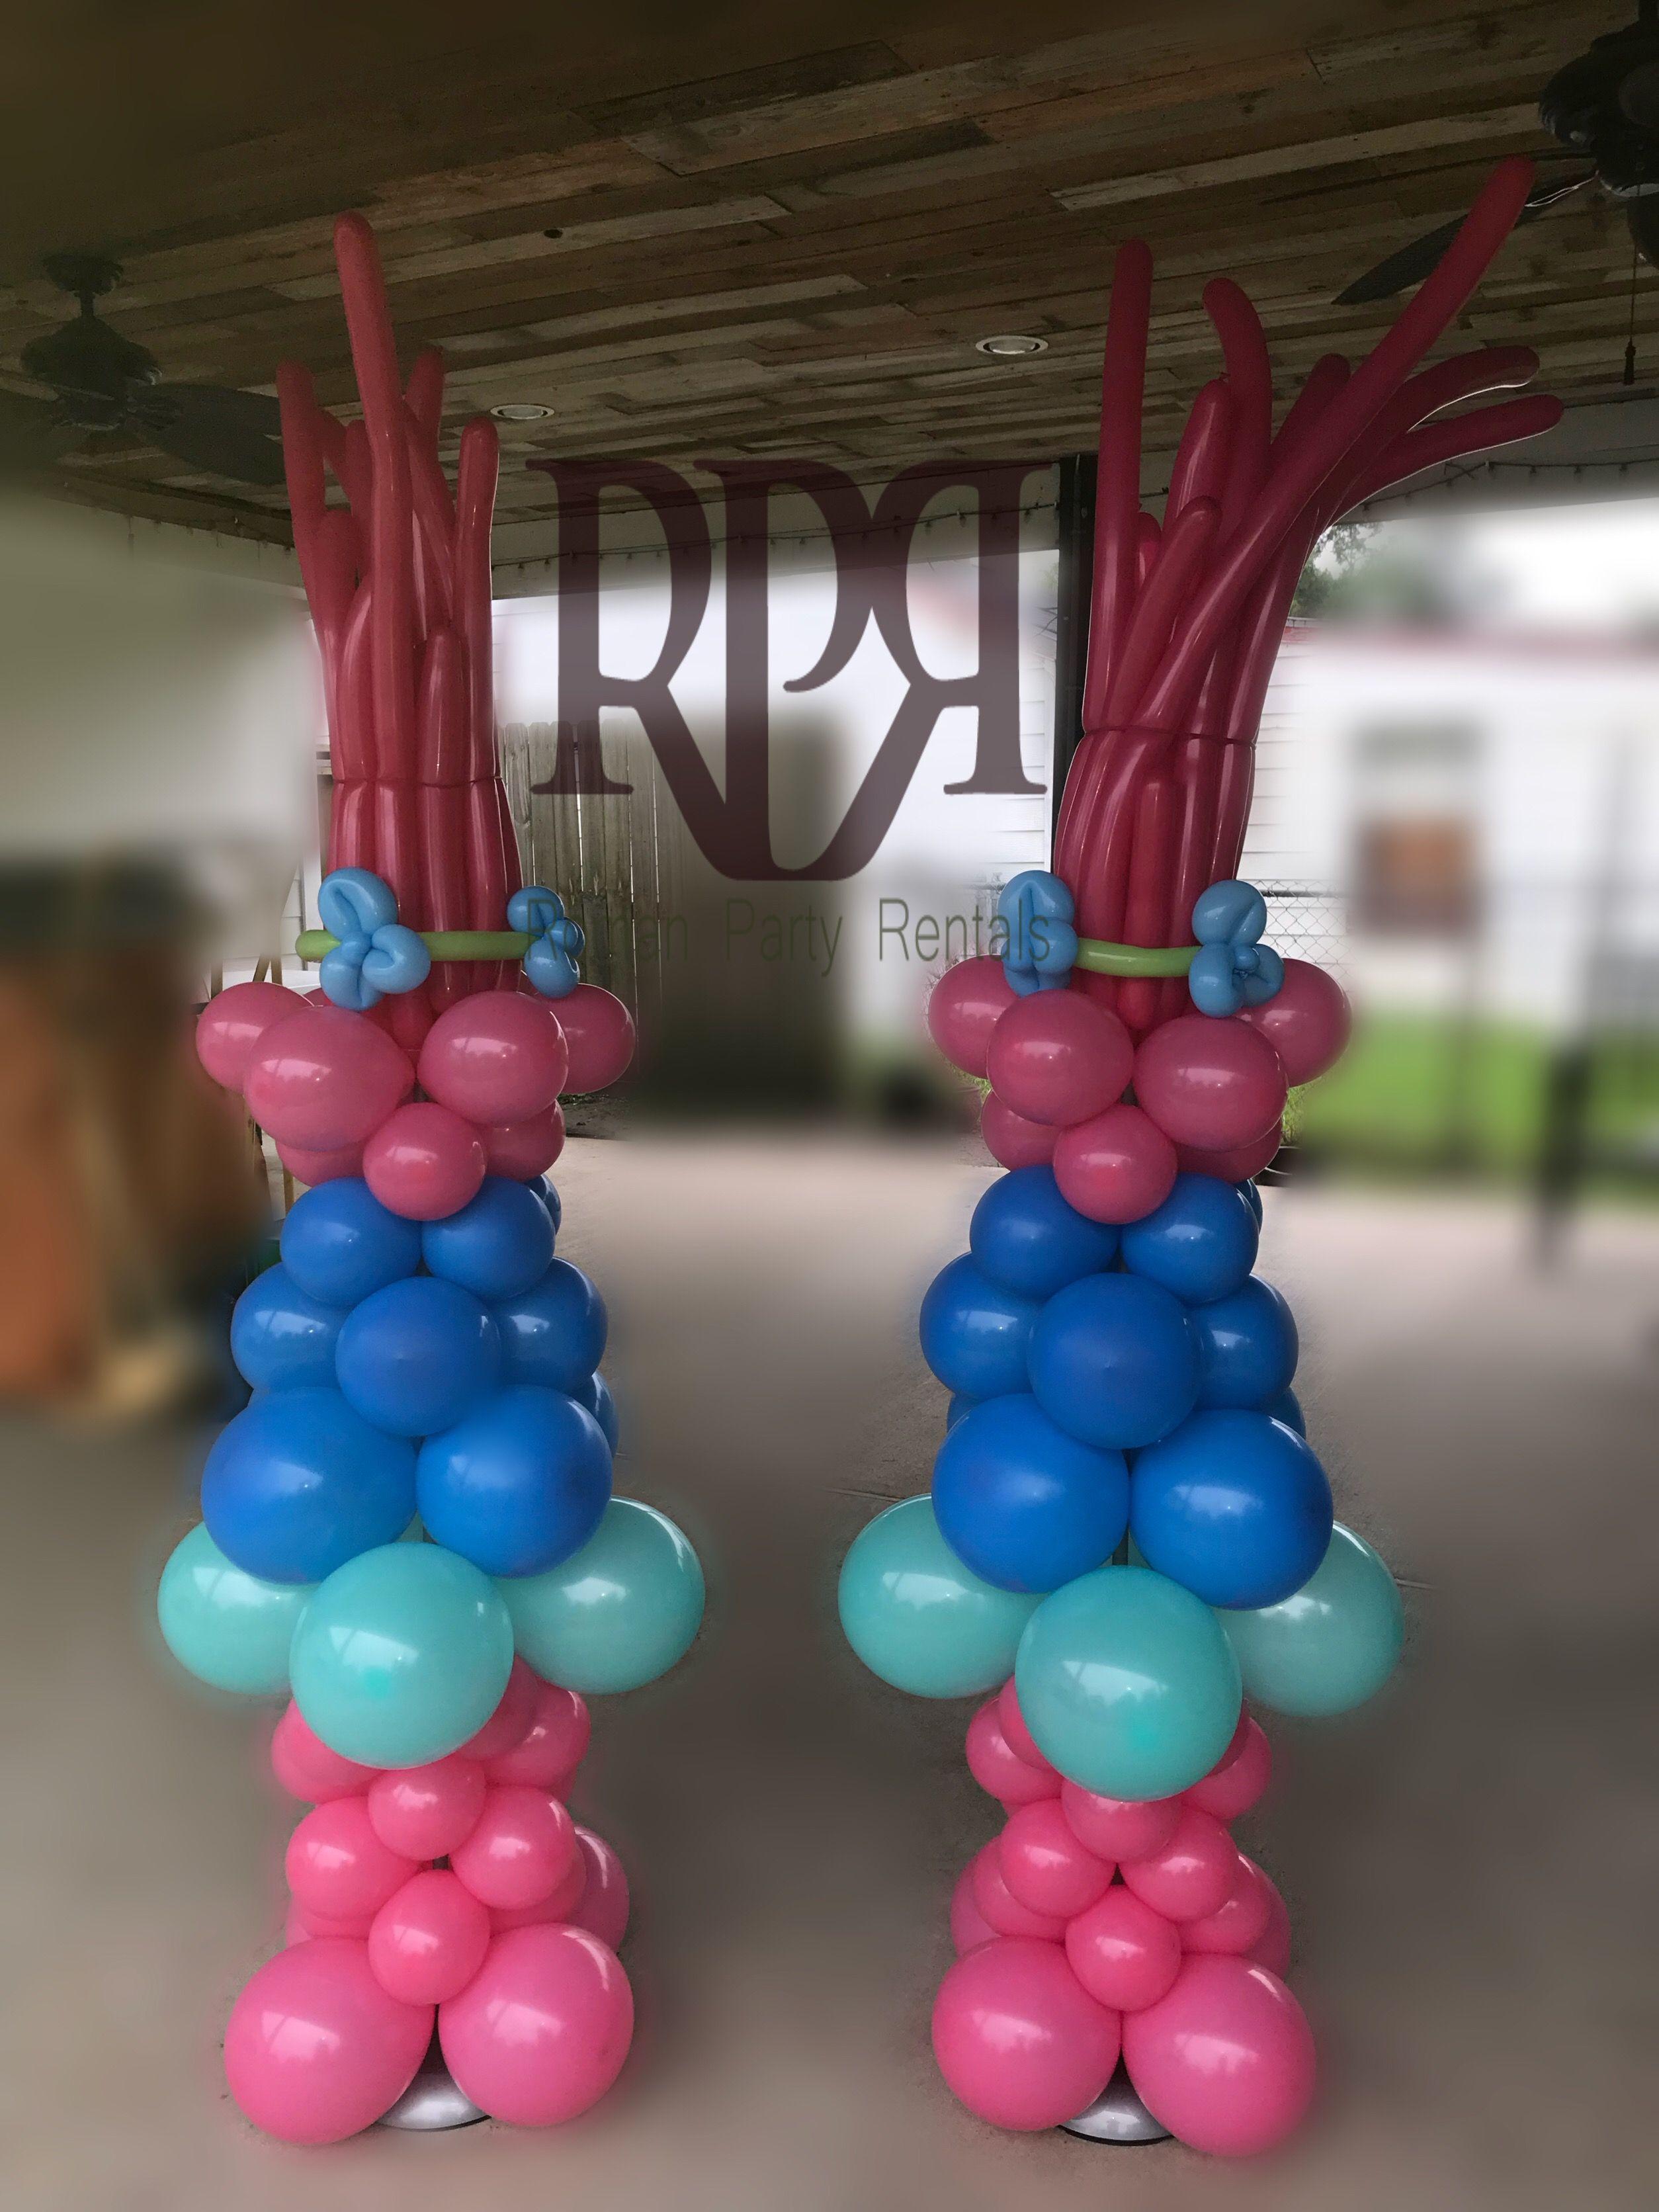 Balloon Decor 29\u201d Birthday party Trolls Poppy Balloon